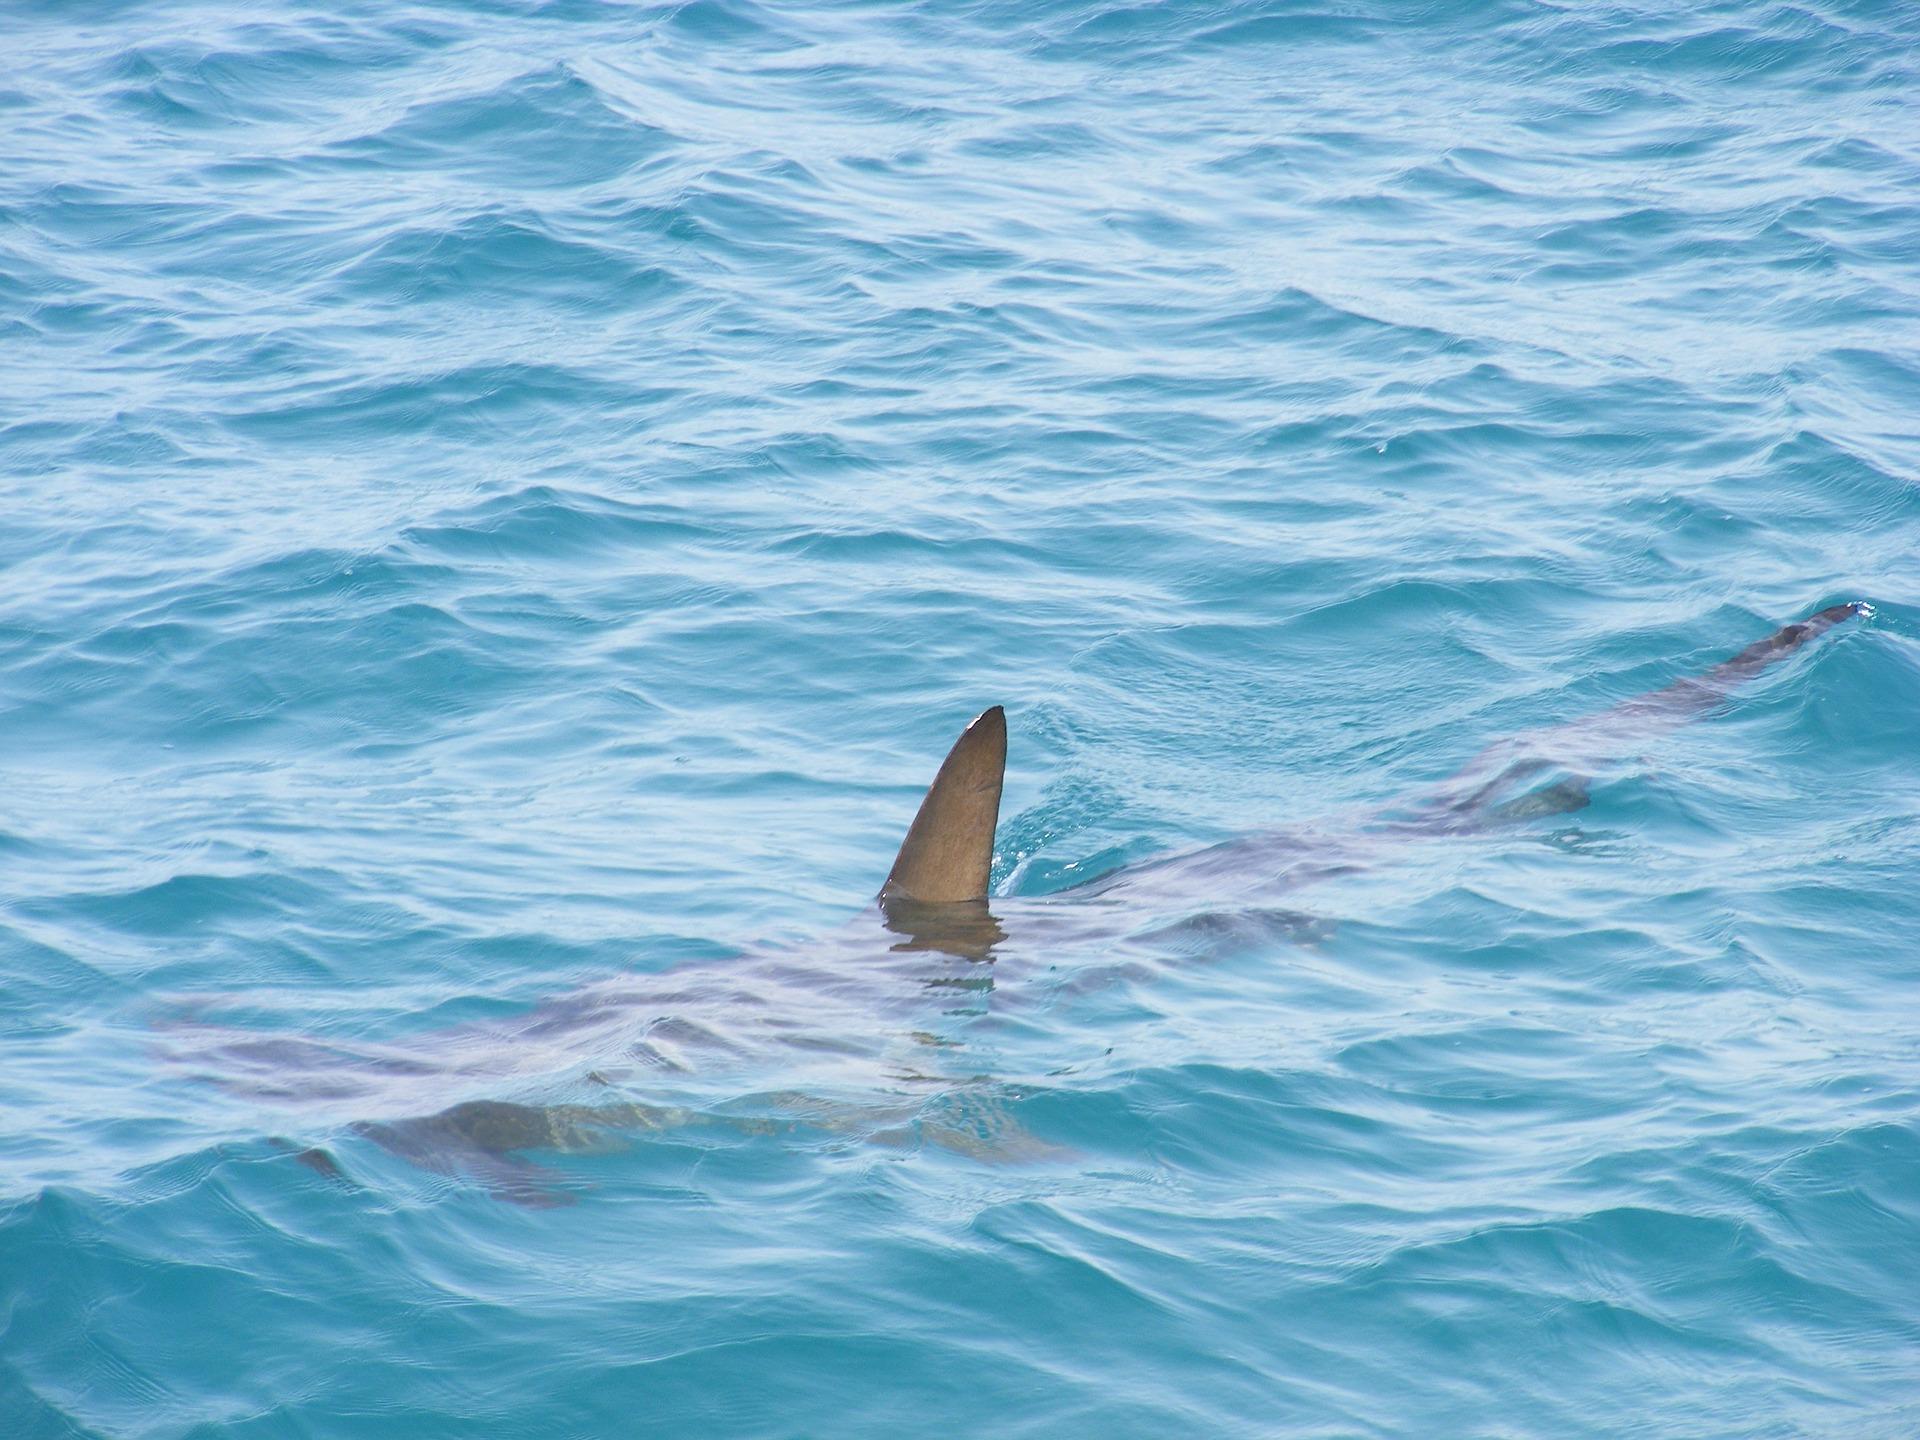 haj hajangreb angreb hajbid hajer australien farlig